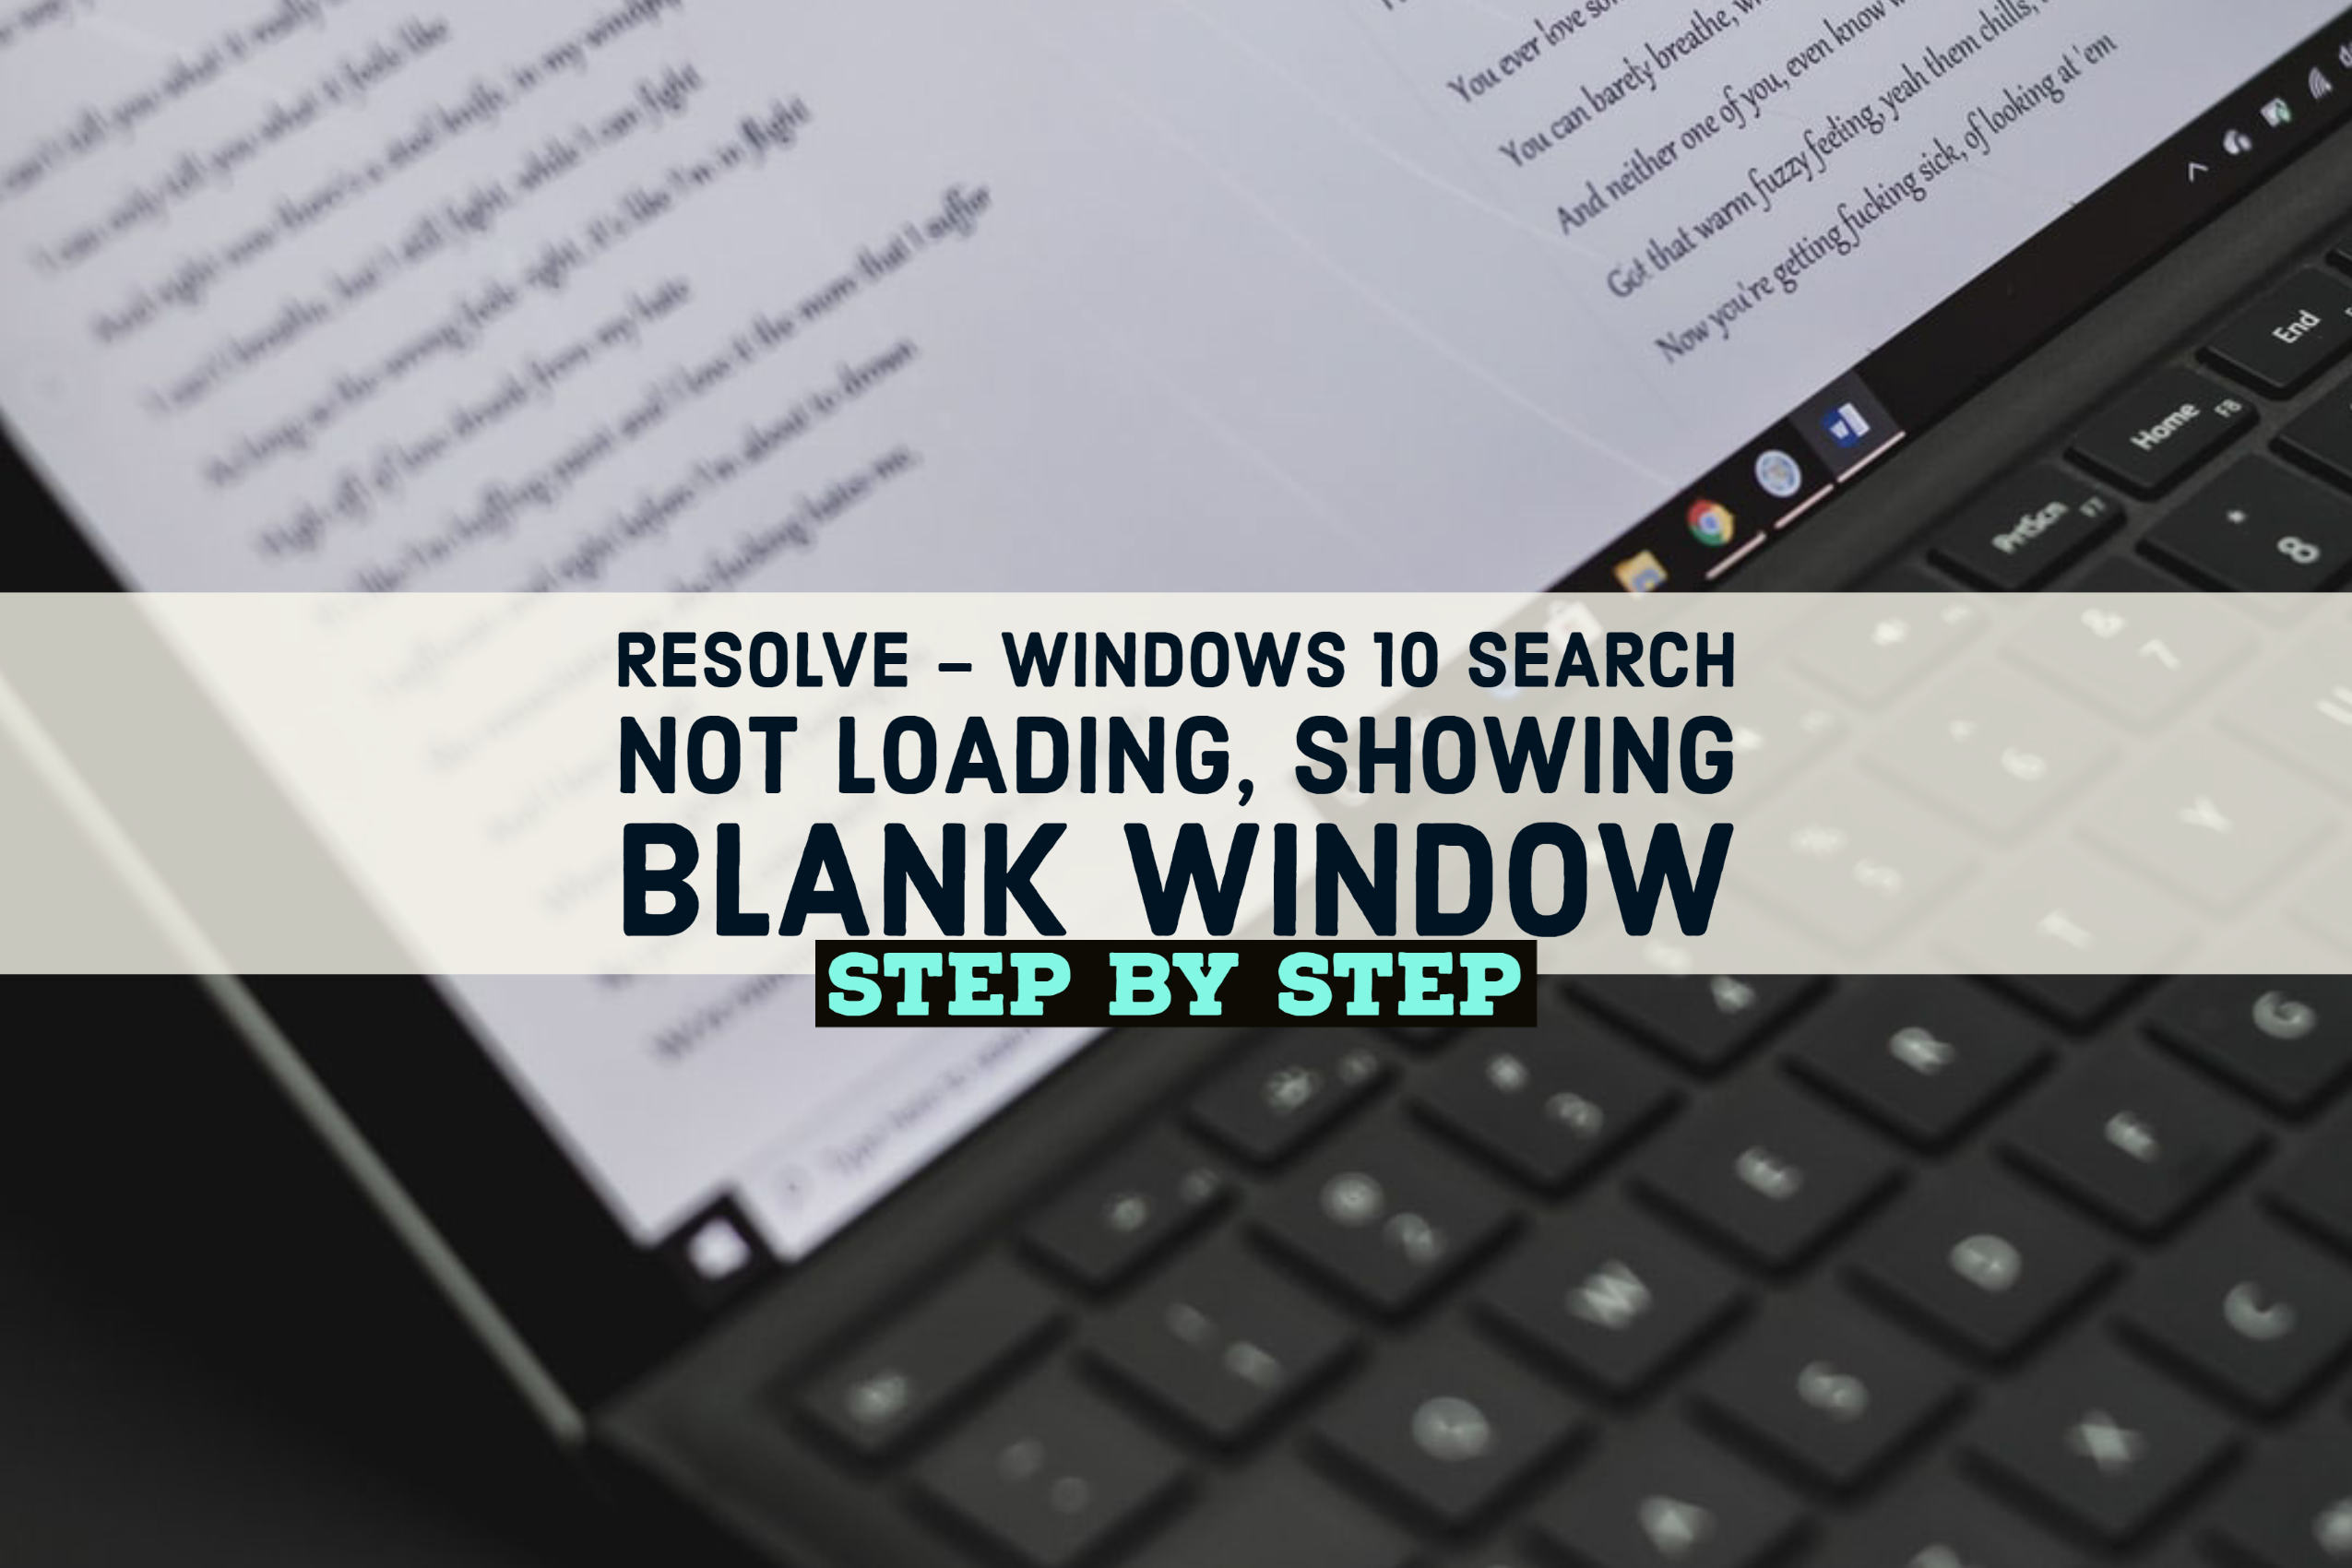 Resolve - Windows 10 Search not loading, showing blank window